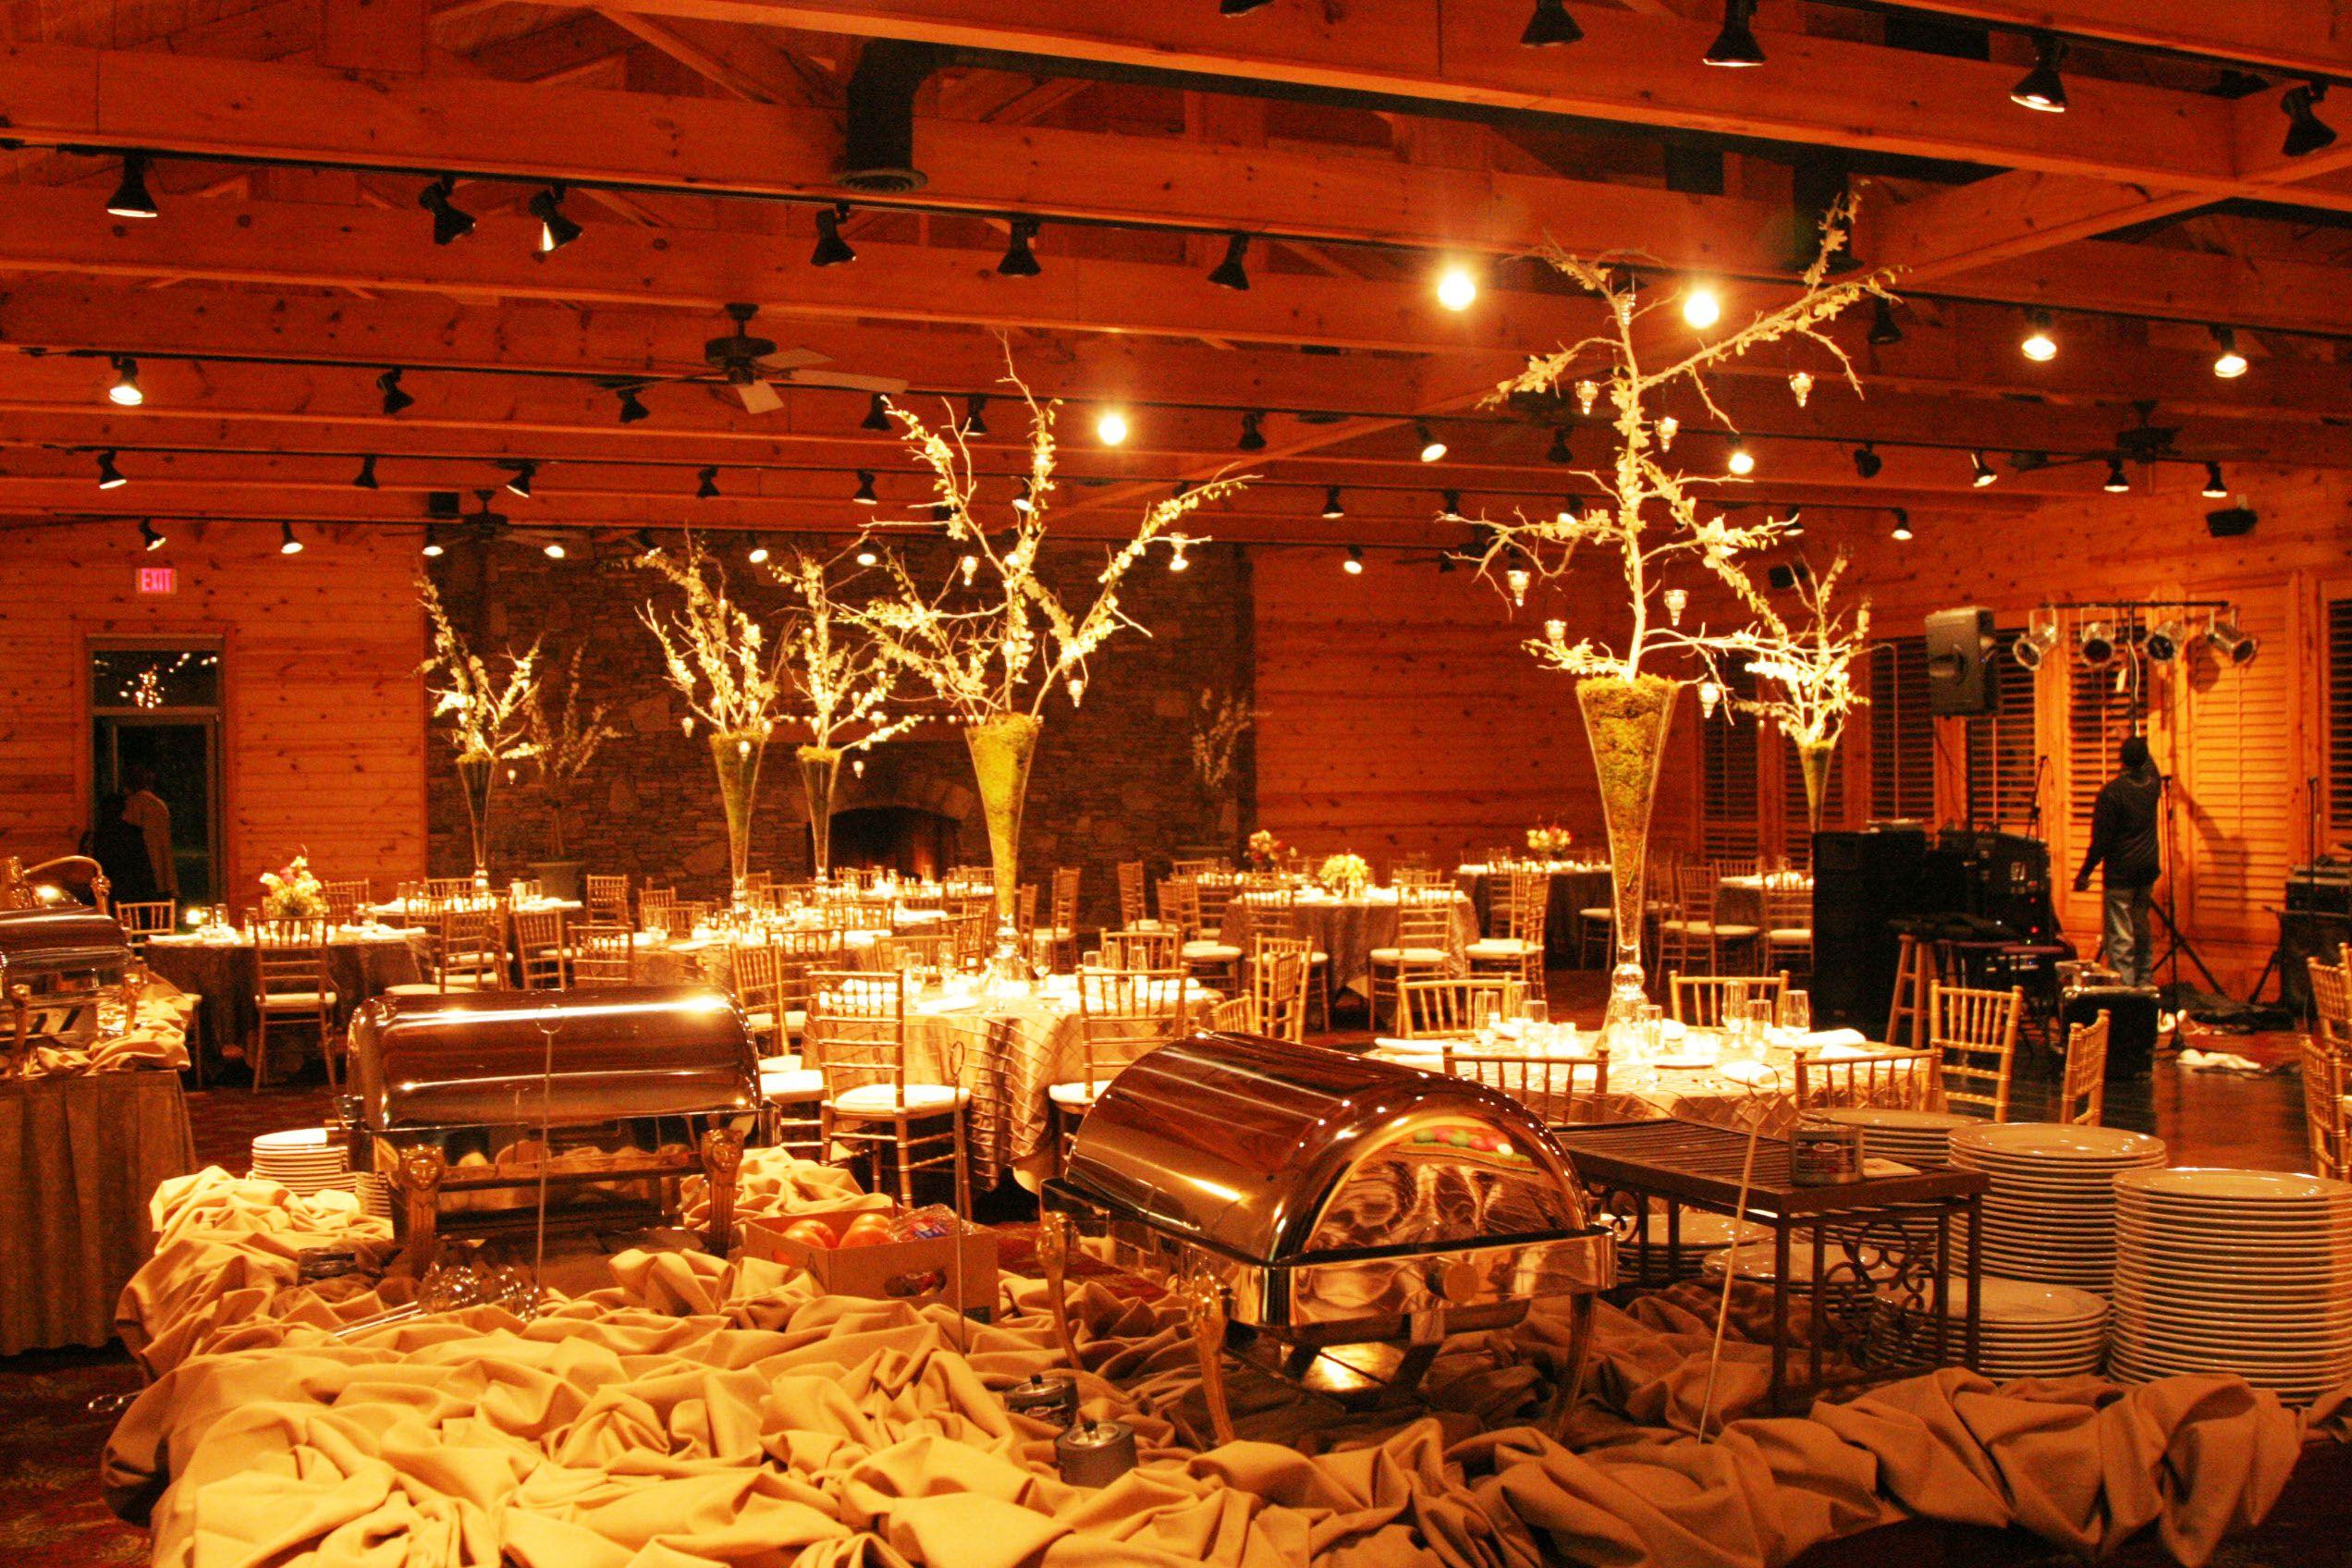 Rustic Elegant ballroom Wedding The Ridges Resort & Marina ...